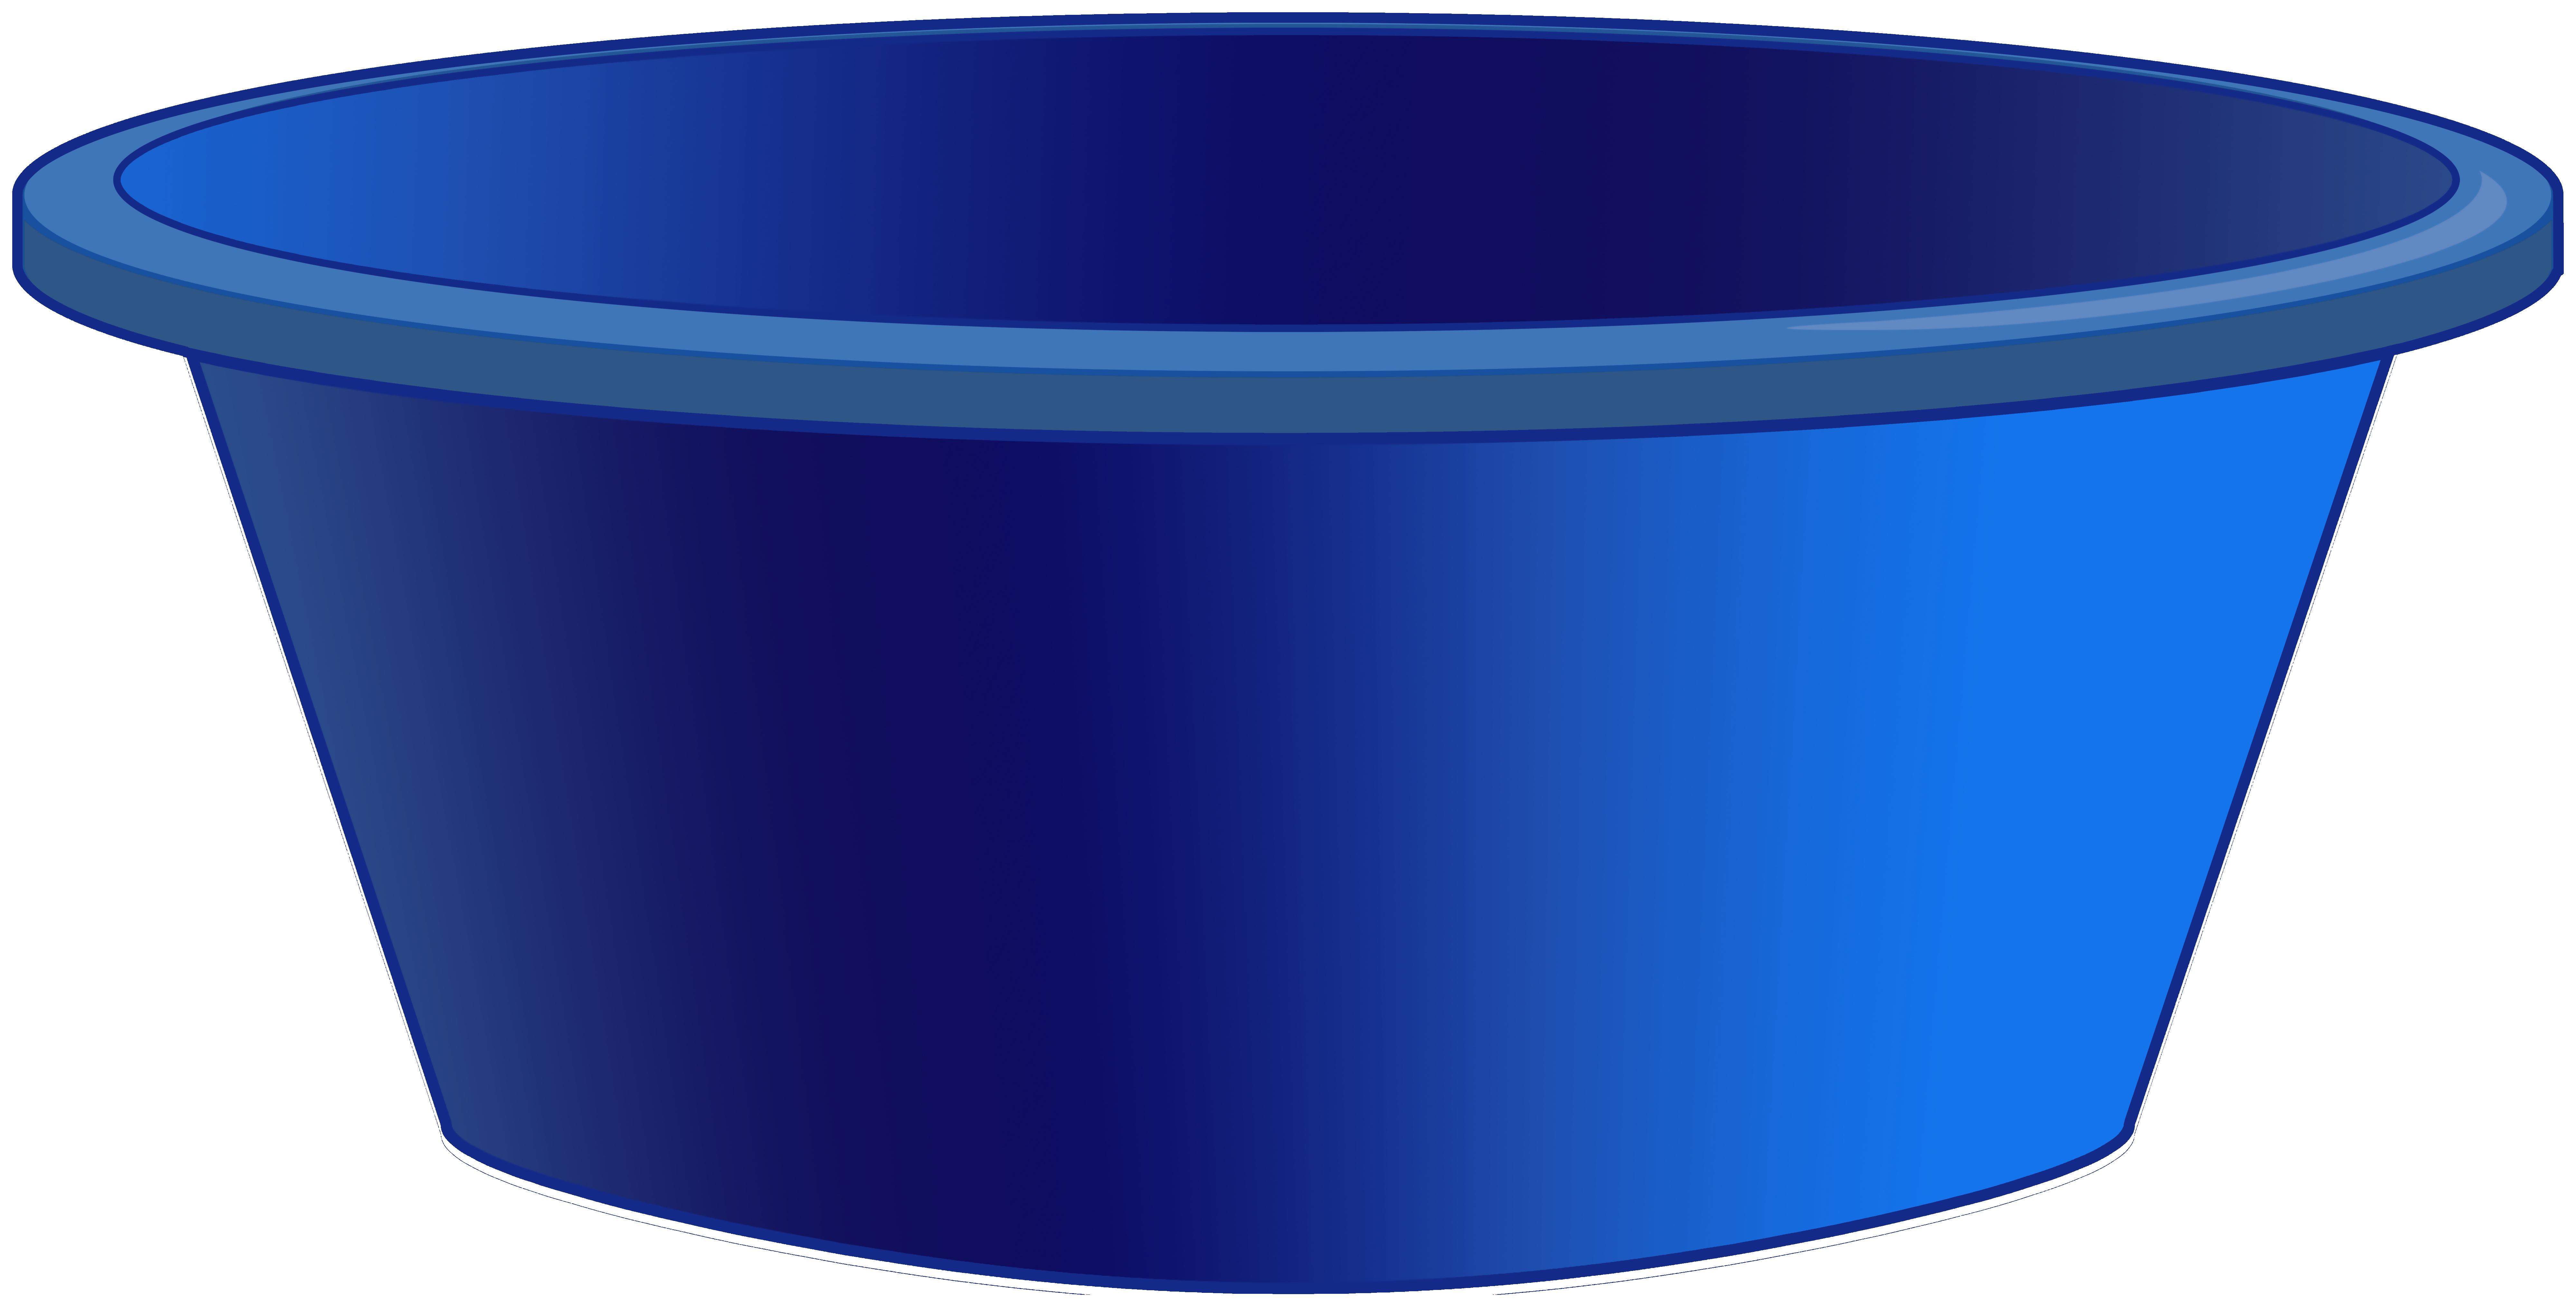 Blue Plastic Tub PNG Clipart.